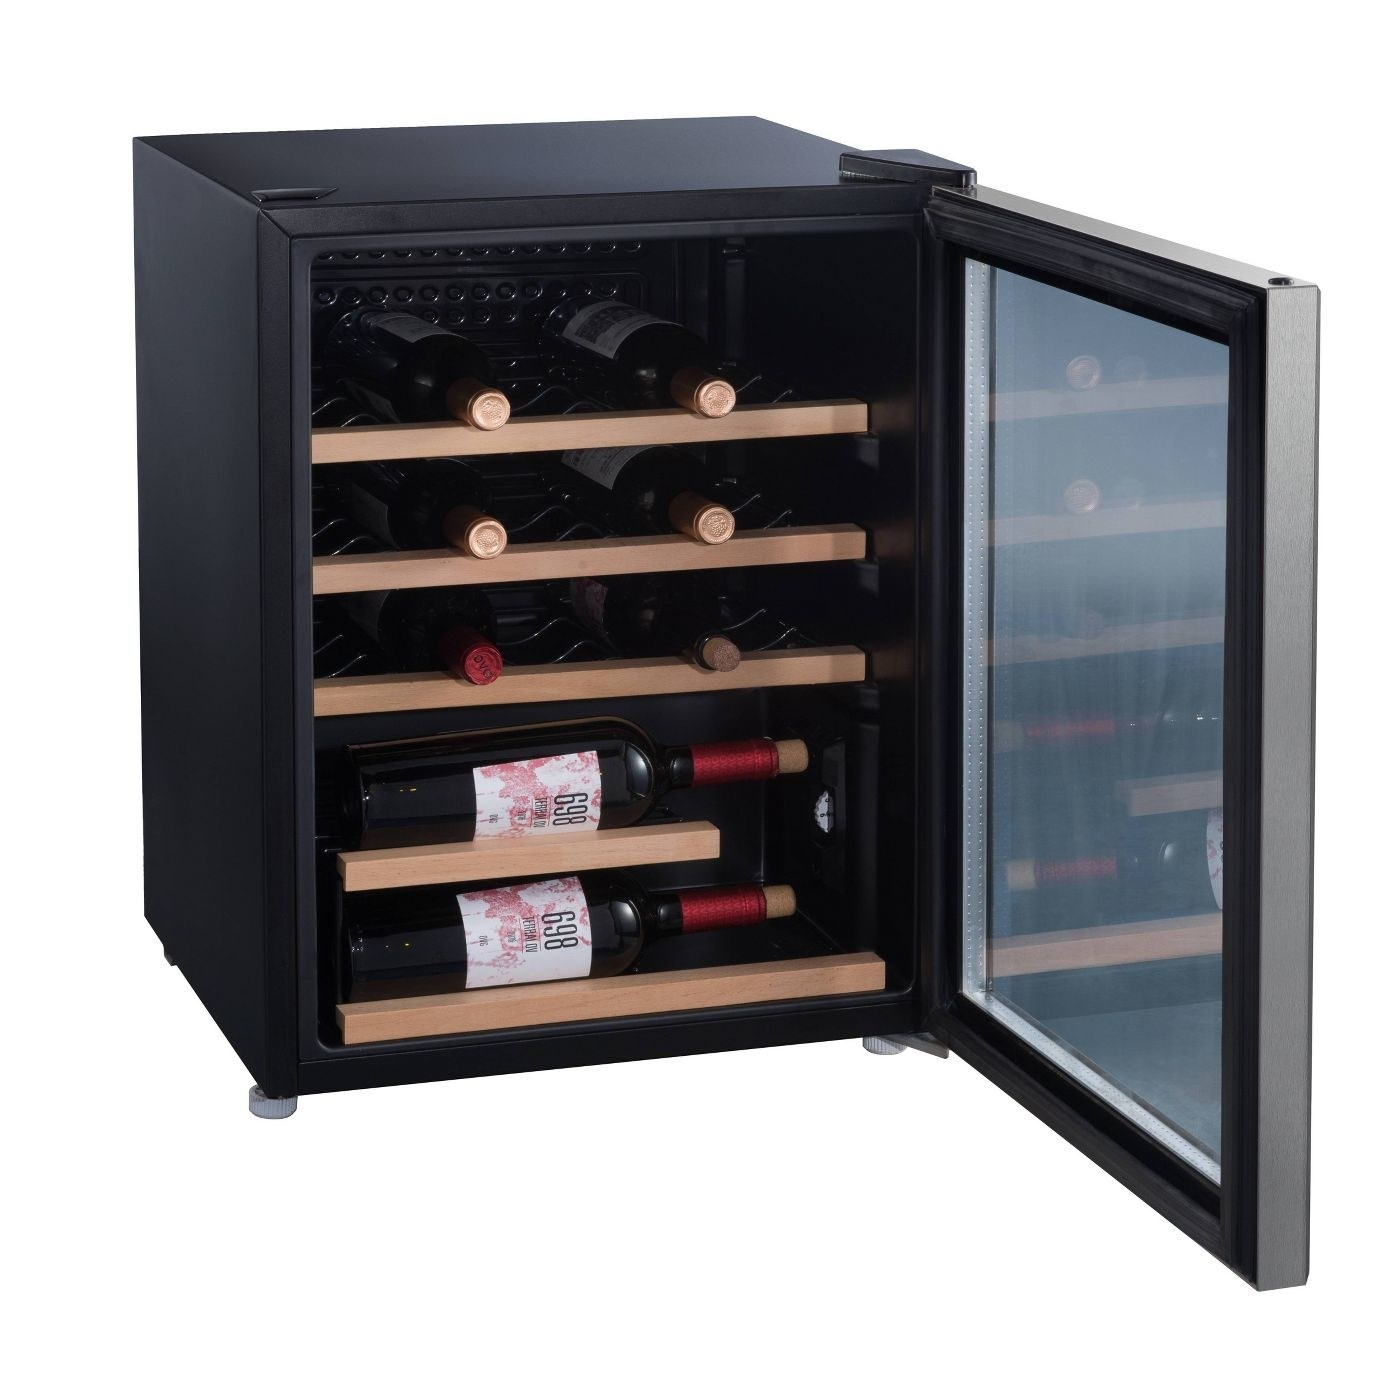 The stainless steel wine fridge